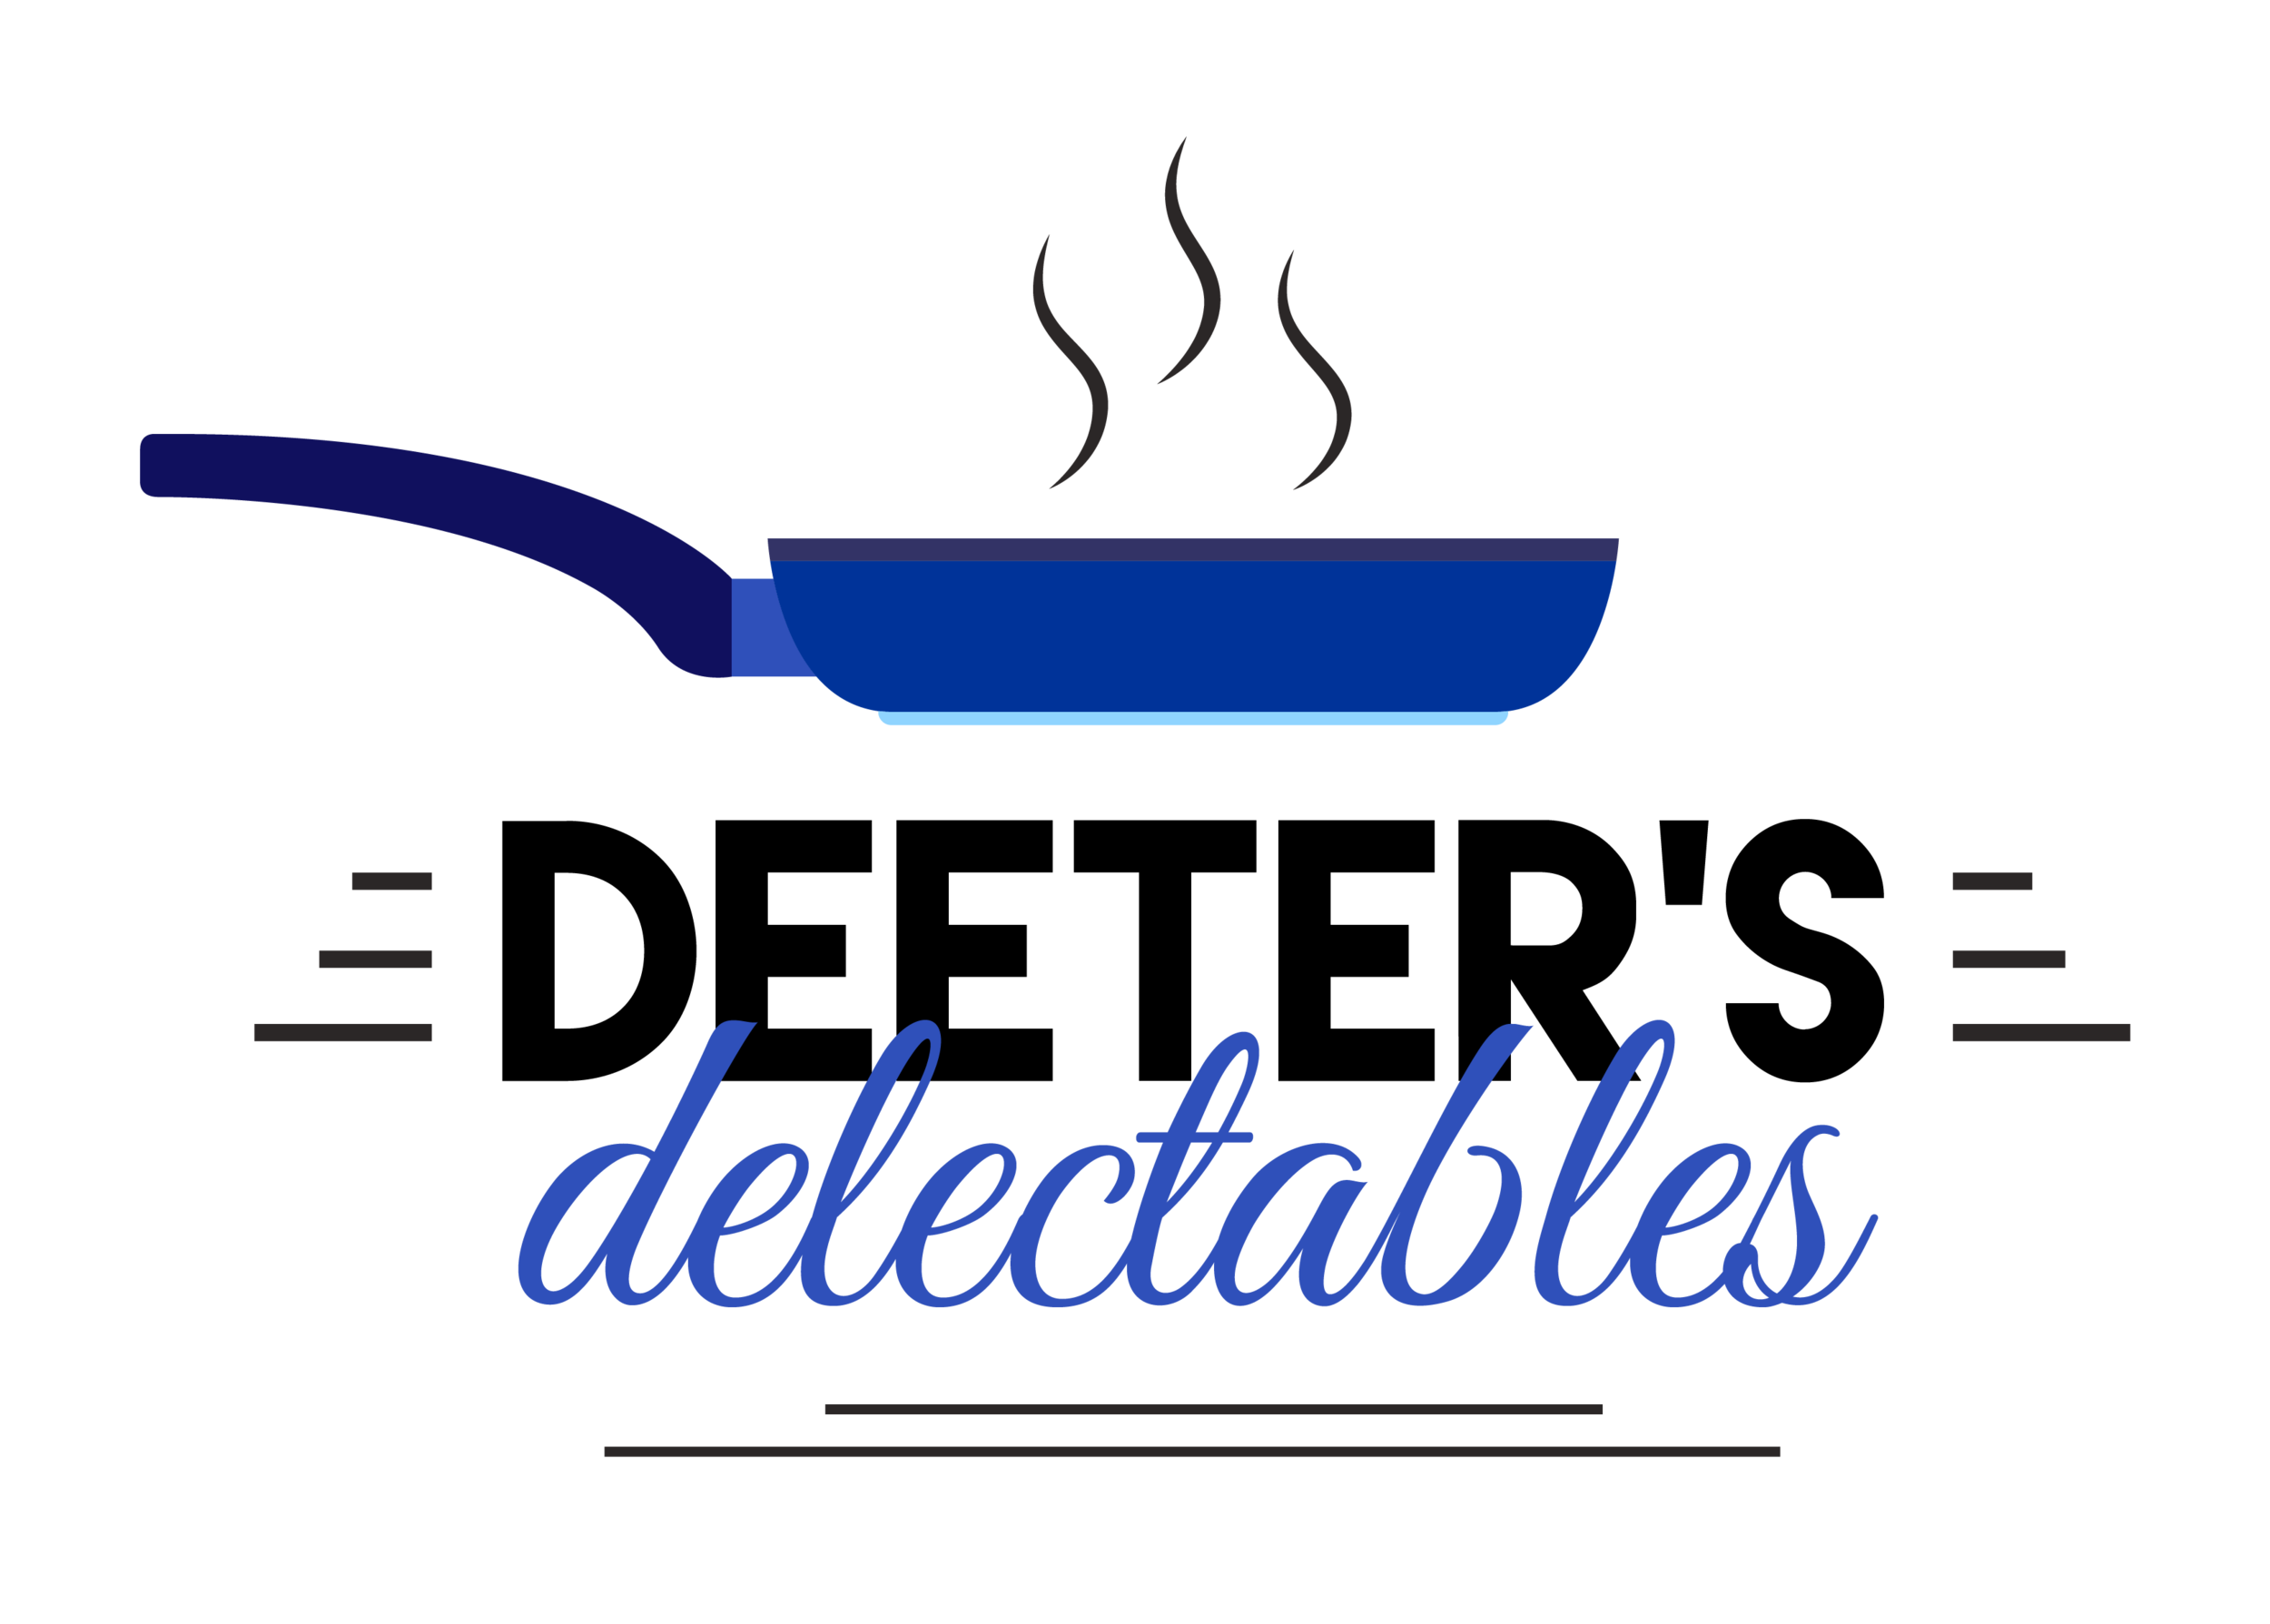 Deeter's Delectables Logo-01 (1).png